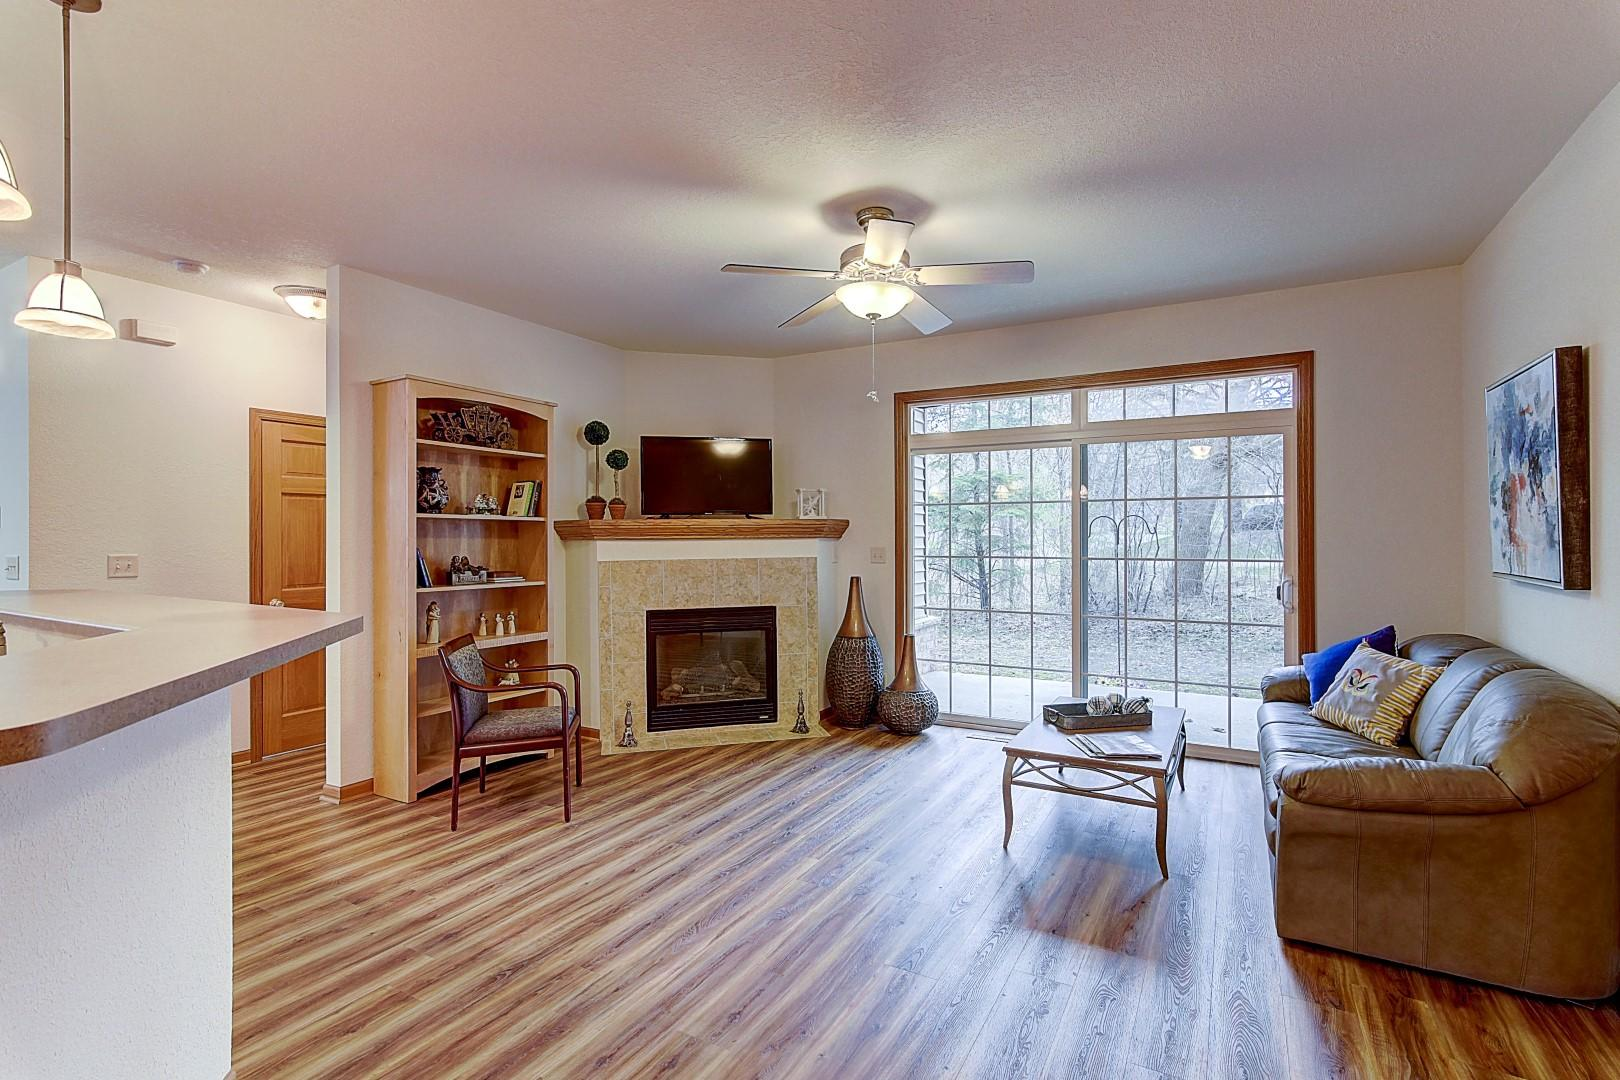 354 Manchester Ln, Hartland, Wisconsin 53029, 2 Bedrooms Bedrooms, ,2 BathroomsBathrooms,Condominiums,For Sale,Manchester Ln,1,1734380